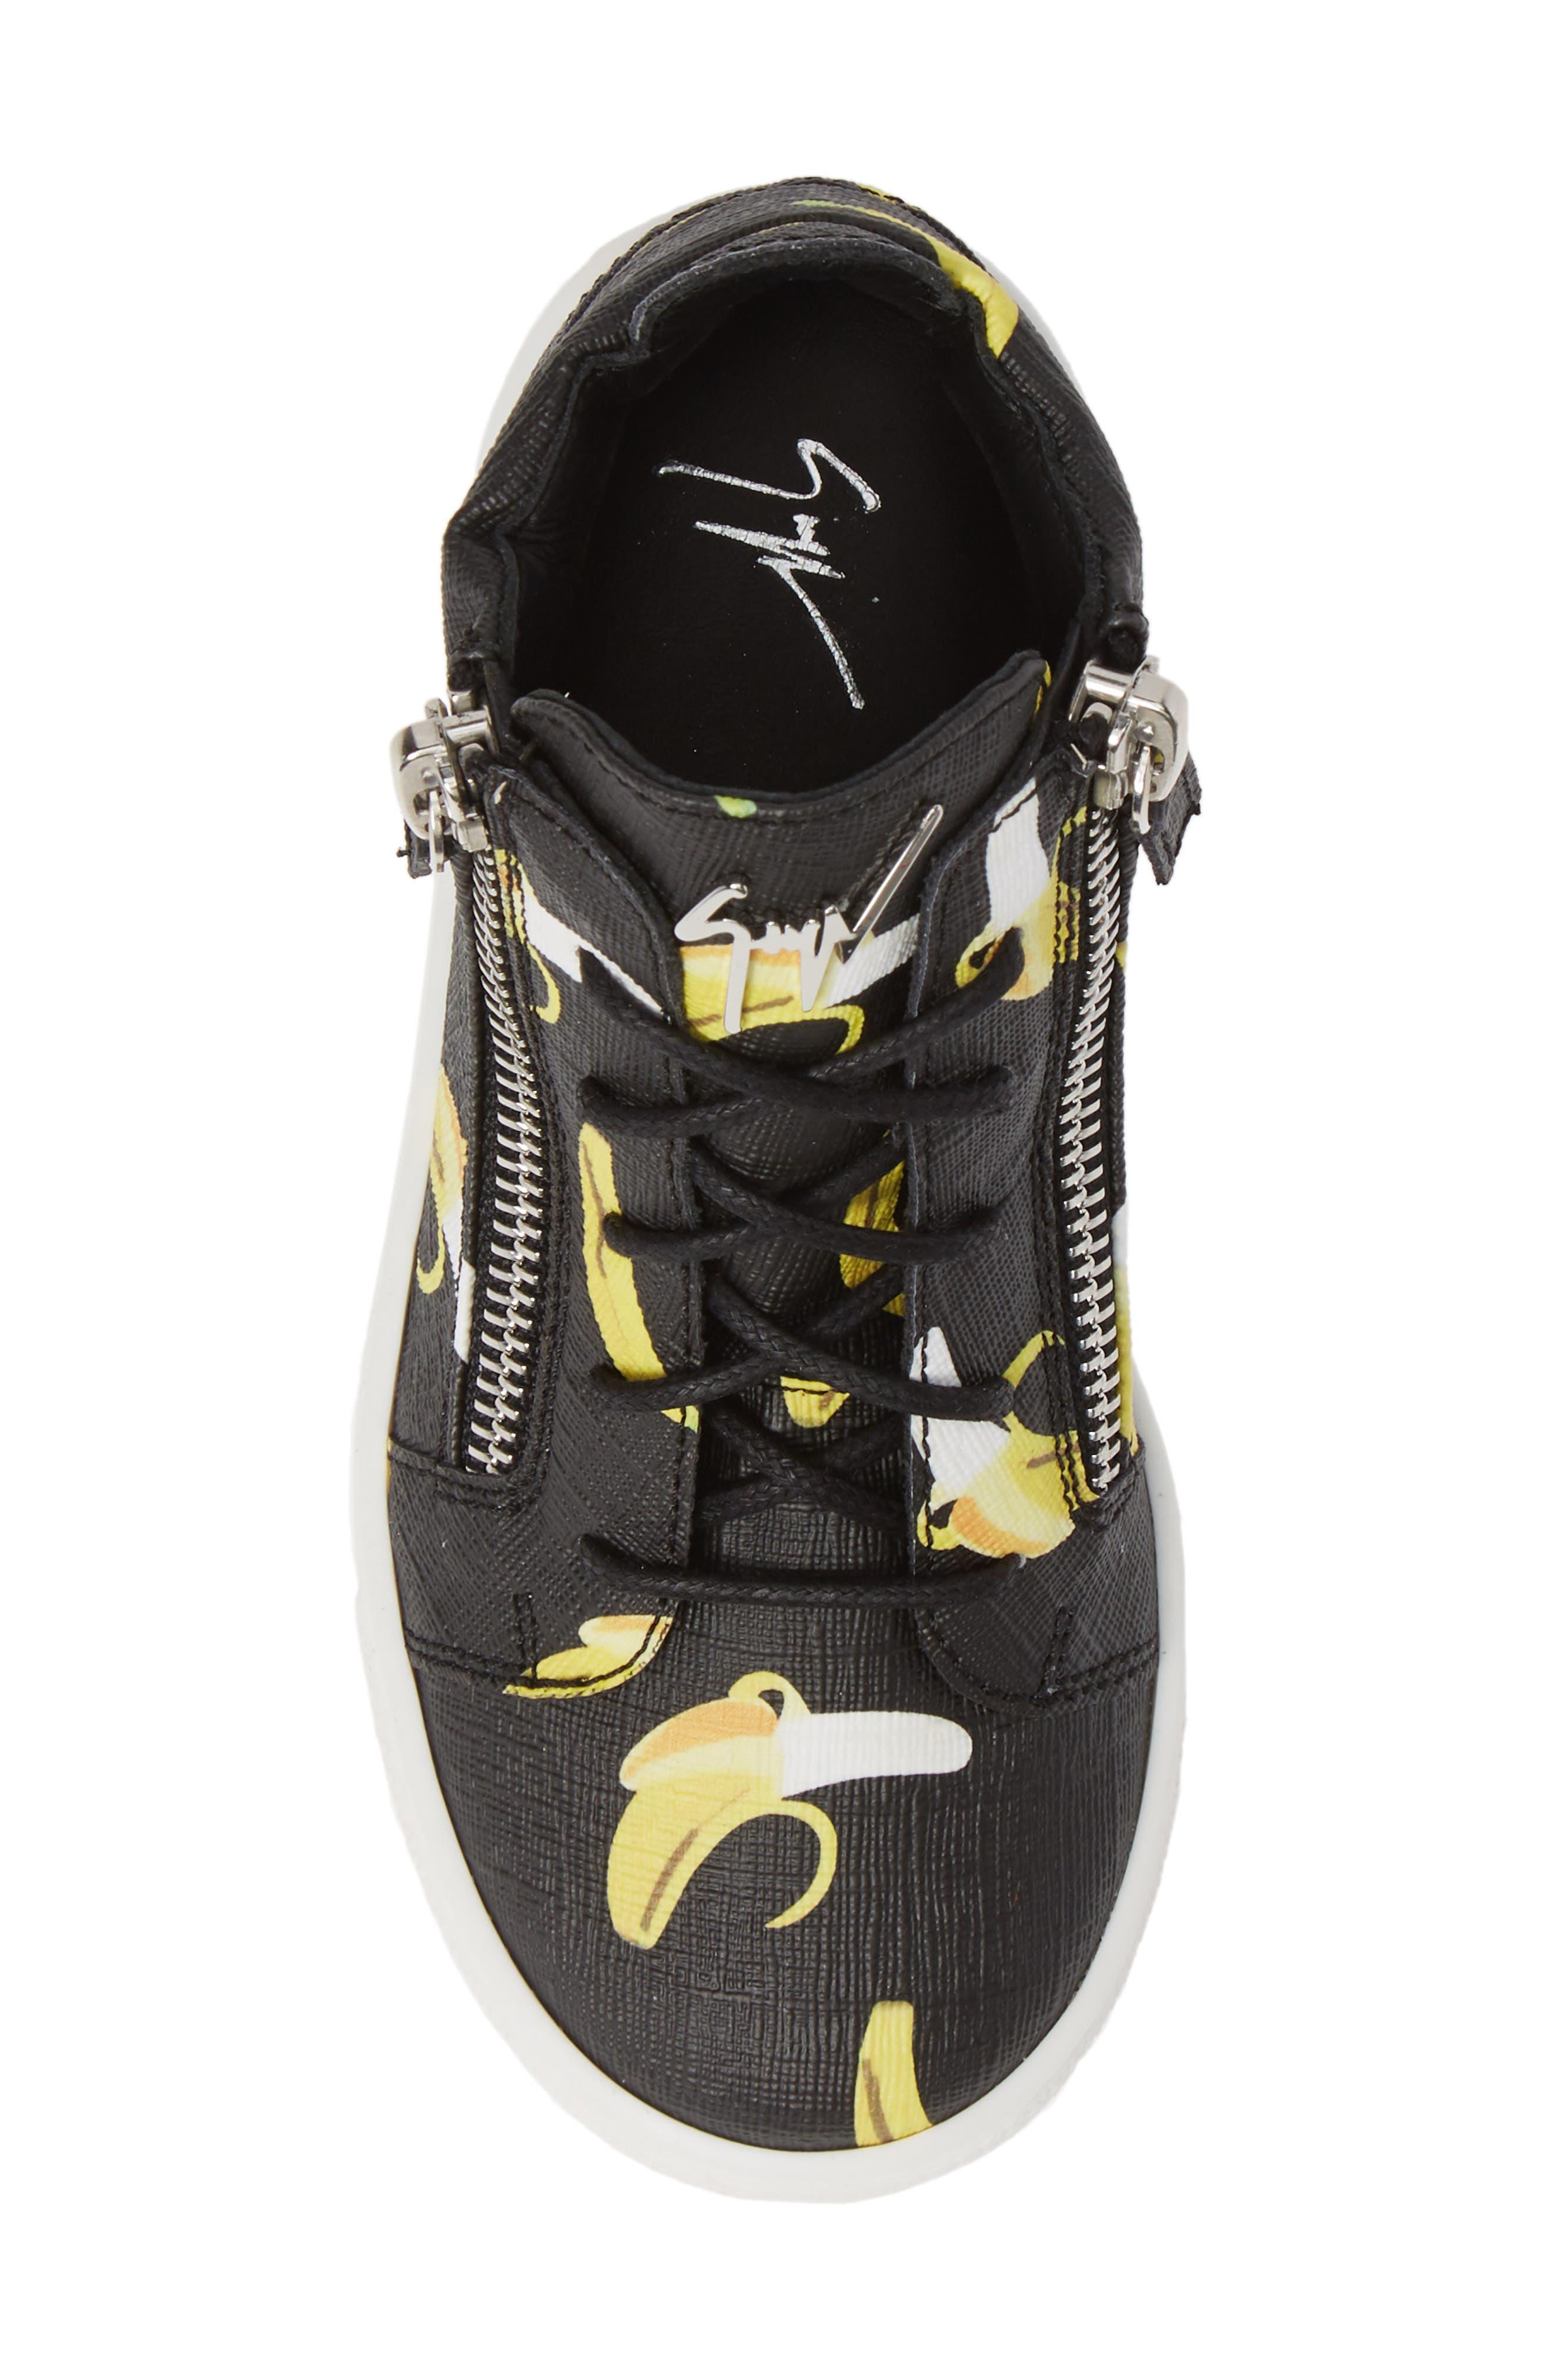 GIUSEPPE ZANOTTI, Kidlondon Banana Print Sneaker, Alternate thumbnail 5, color, BANANAS